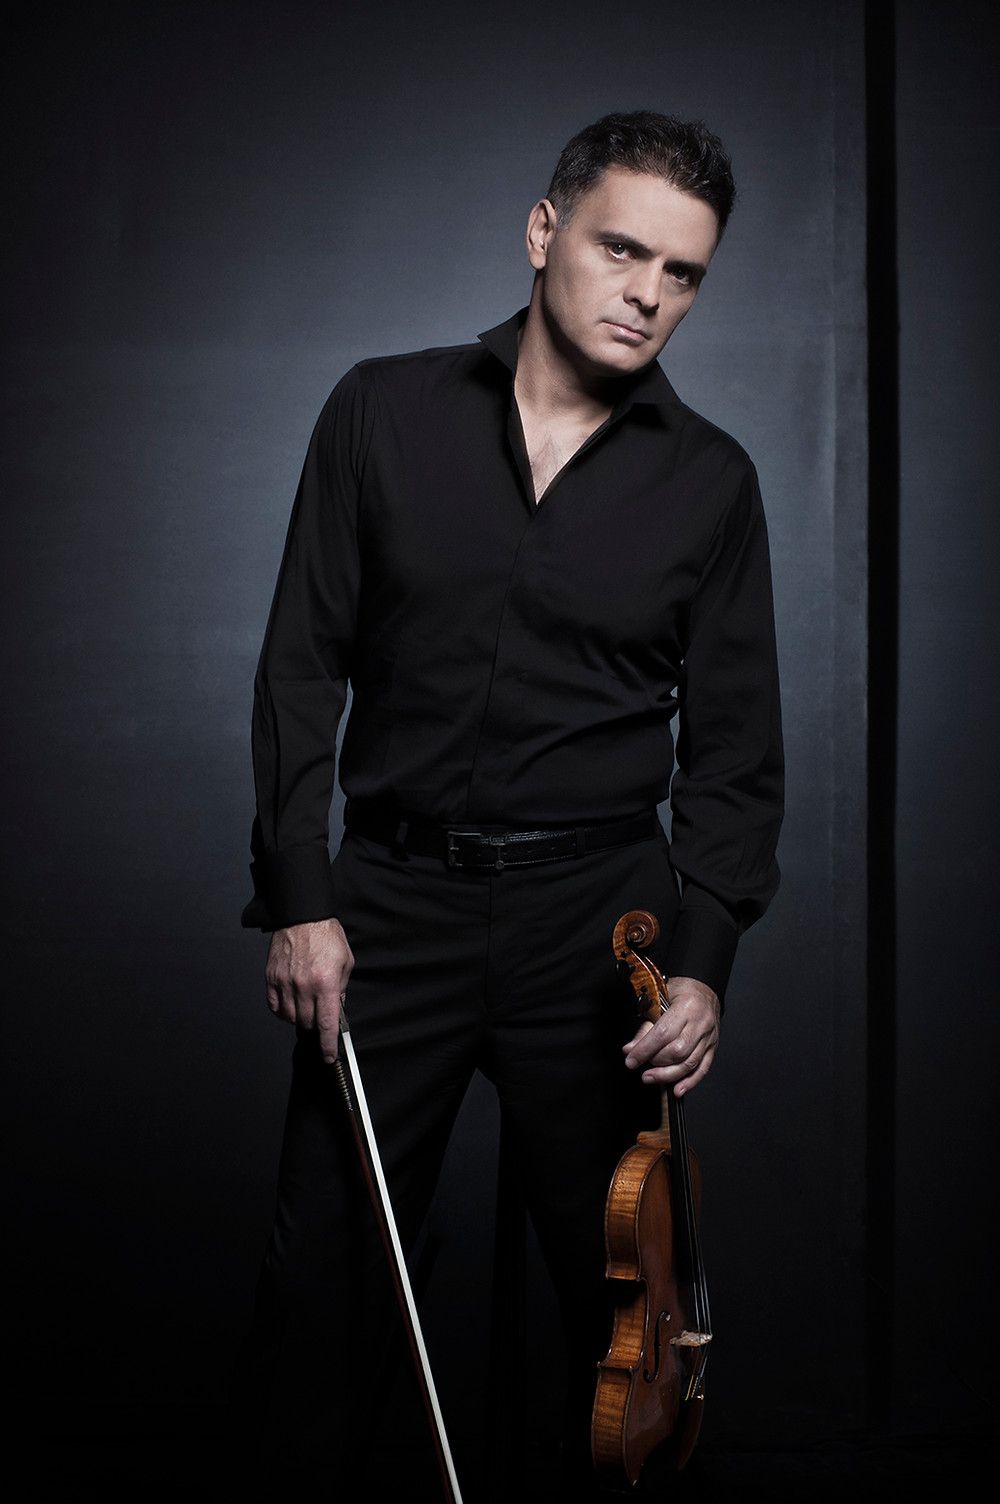 Vasko Vassilev, Concert Master of the Royal Opera House